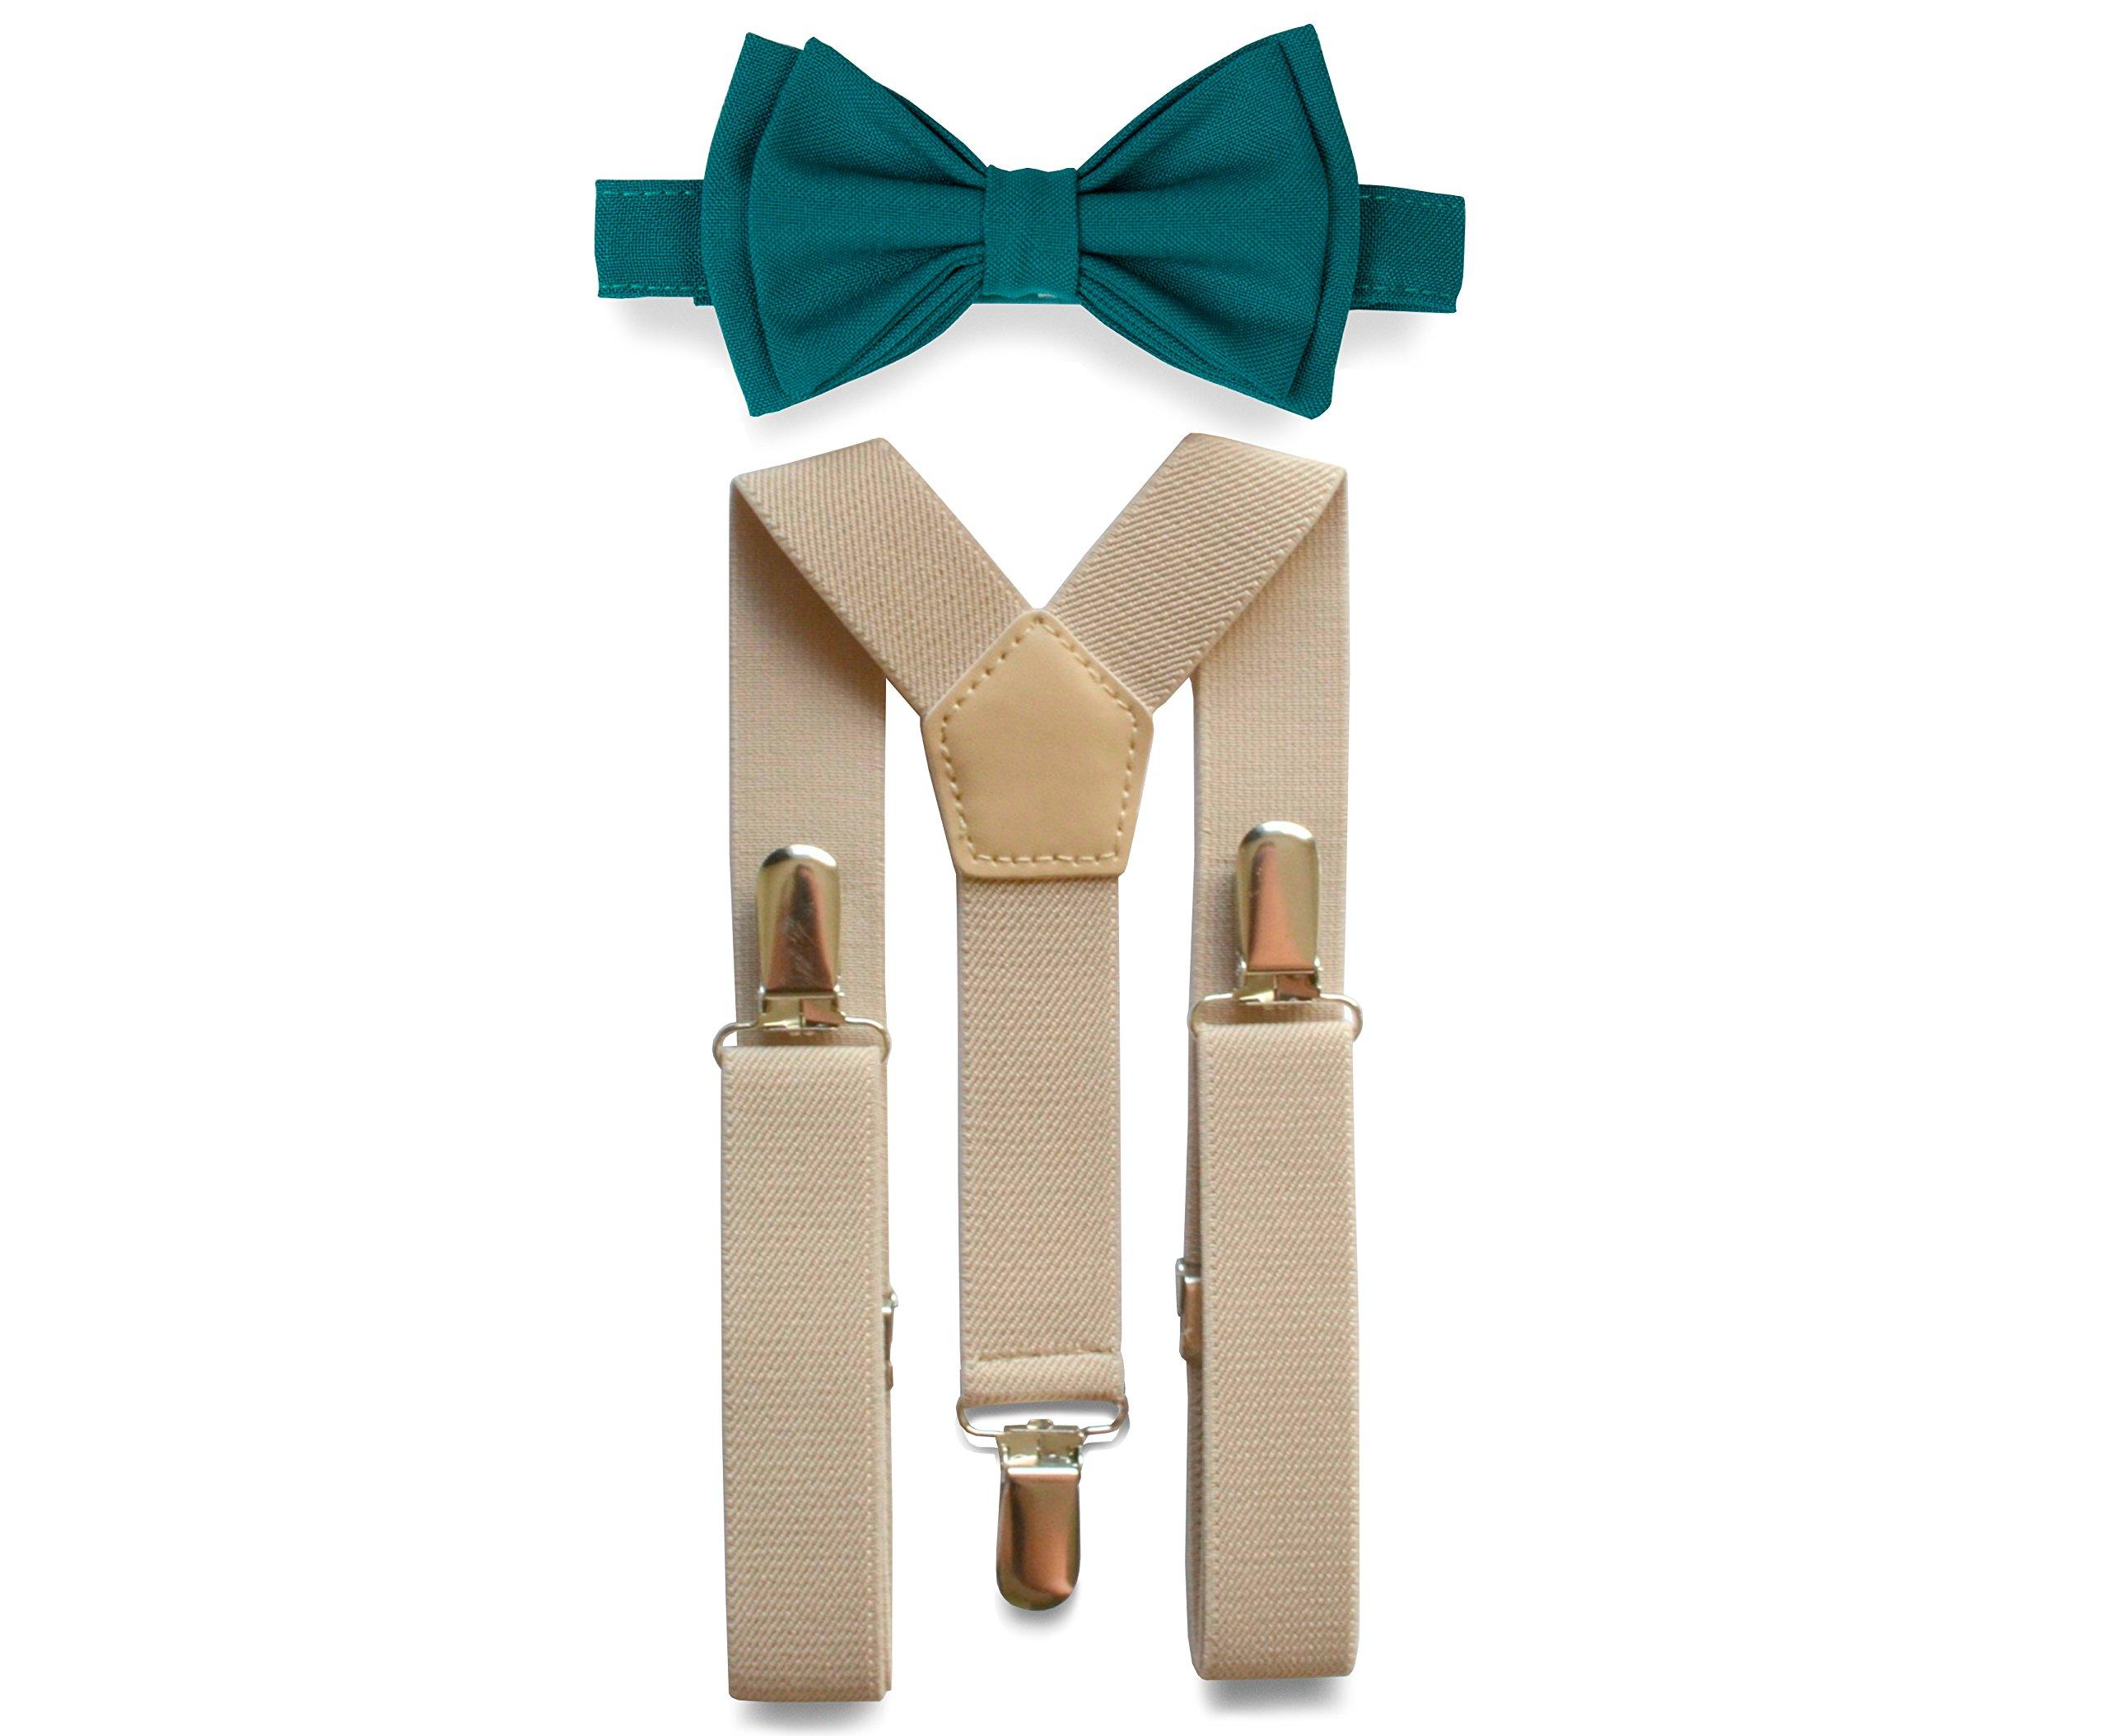 Tan Suspenders & Bow Tie Set for Baby Toddler Boy Teen Men (2. Toddler (18 mo - 6 yrs), Tan Suspenders, Teal Bow Tie)